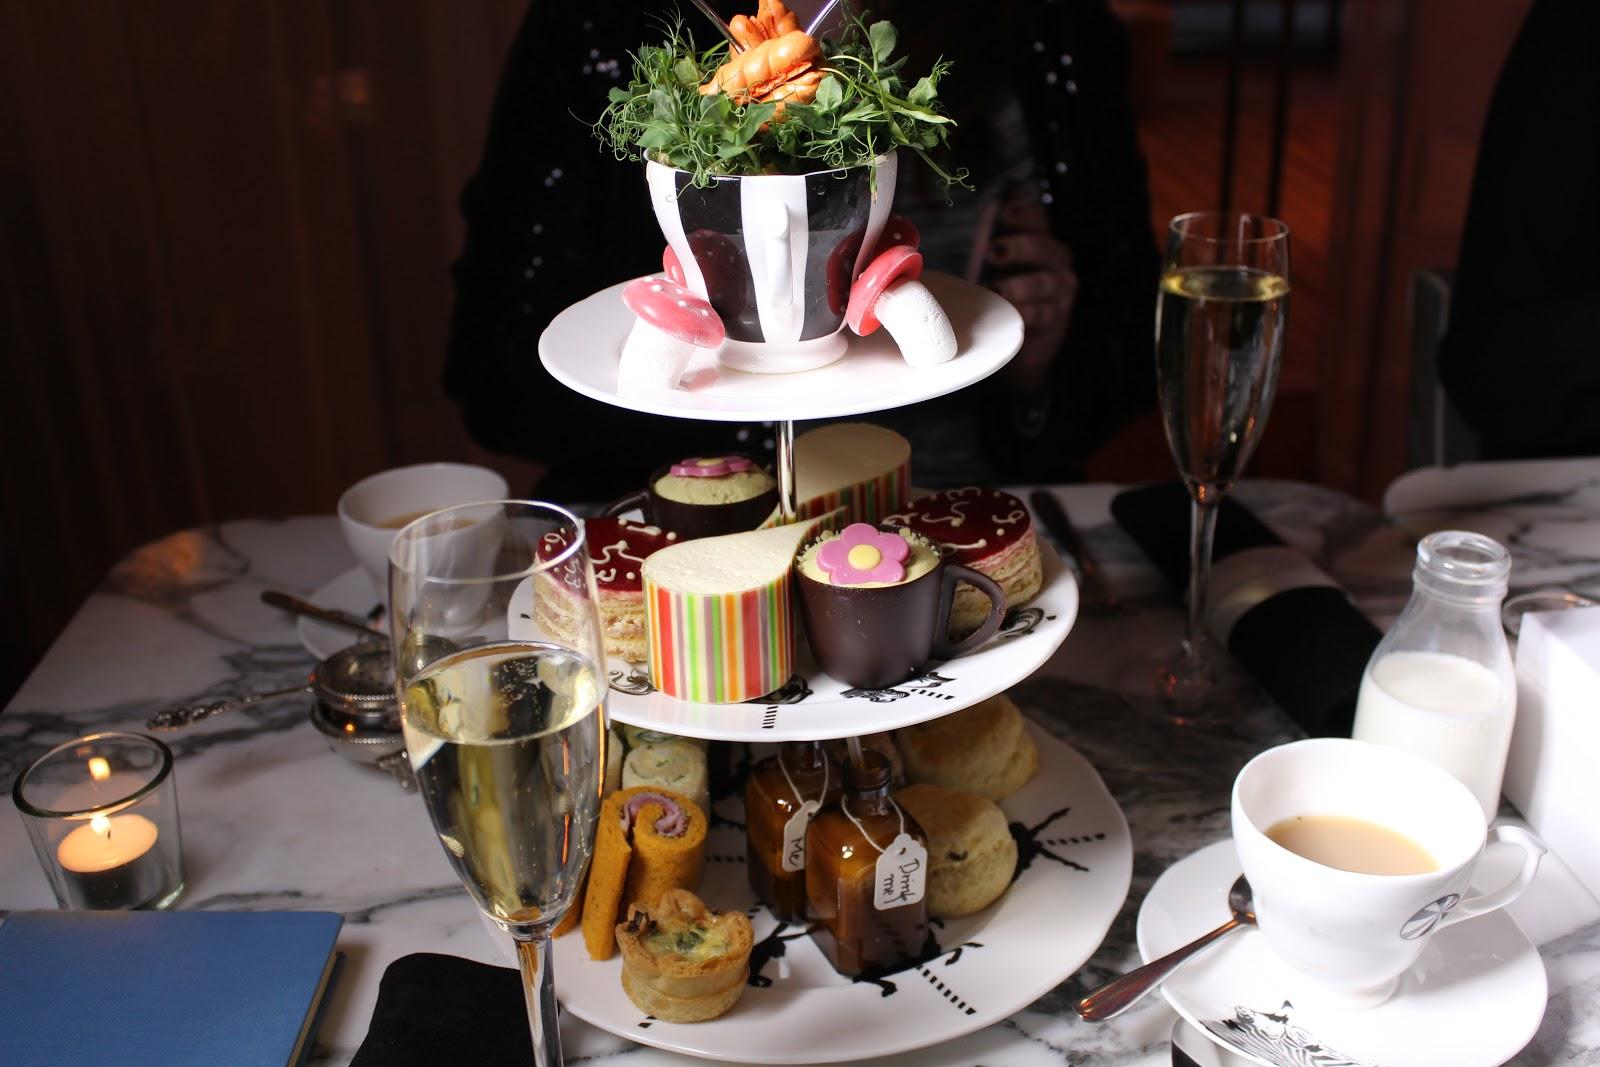 http://4.bp.blogspot.com/-aLltEl5mU_c/UMtrAS5ojTI/AAAAAAAAIk8/A86mkjAjSgc/s1600/The-Sanderson-Mad-Hatters-Tea-Party-7.JPG